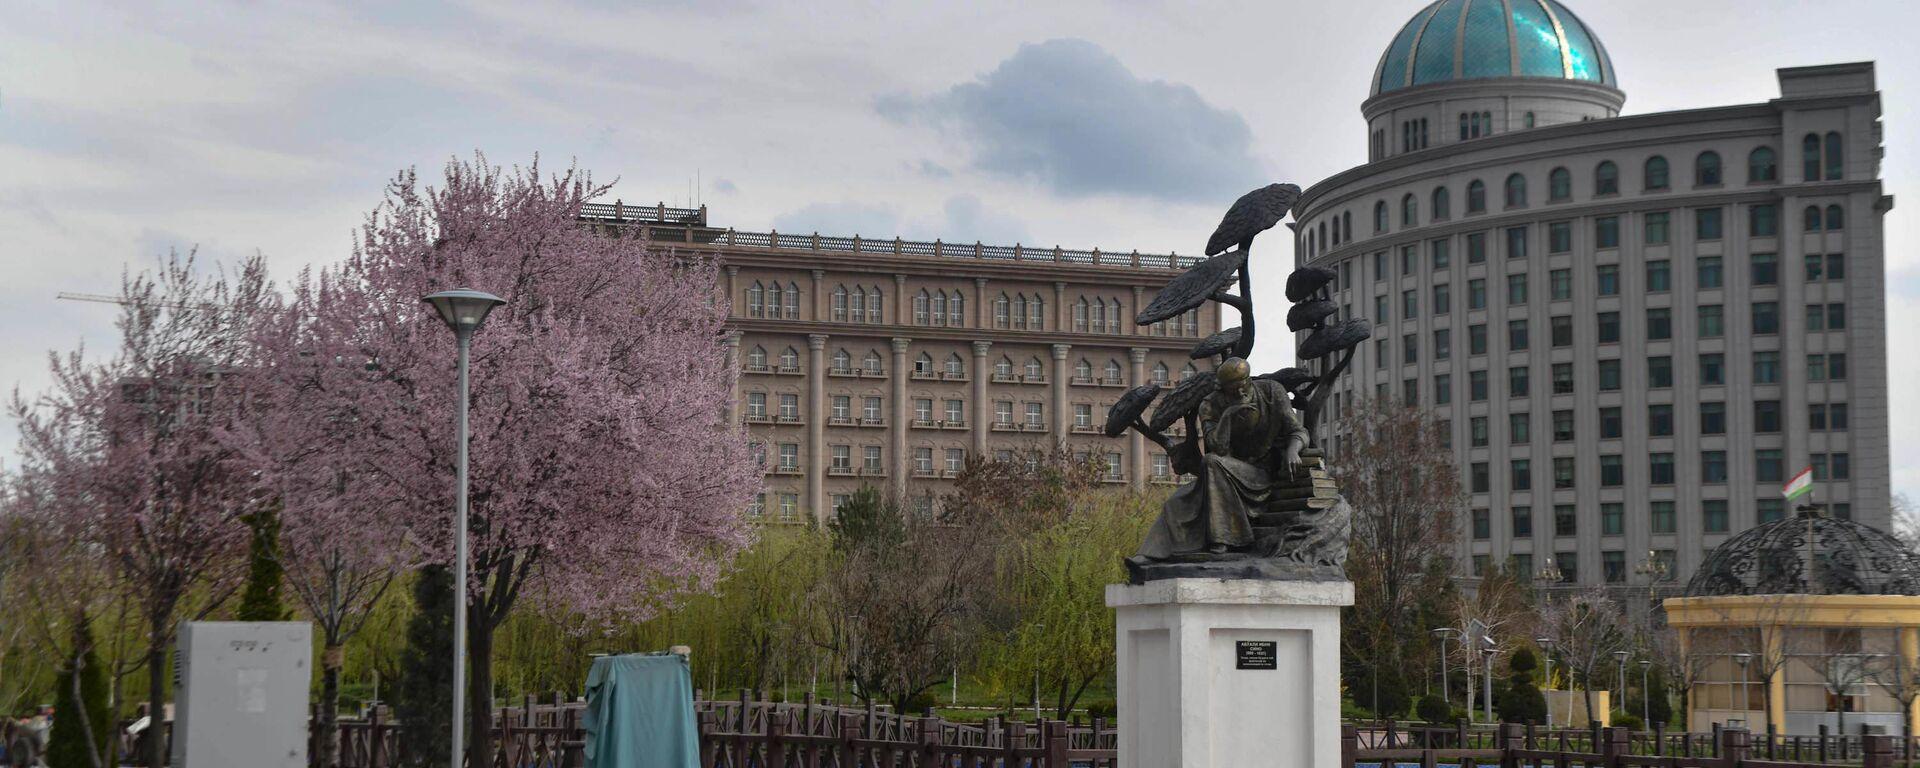 Здание Хукумата и МИД - Sputnik Таджикистан, 1920, 19.05.2021